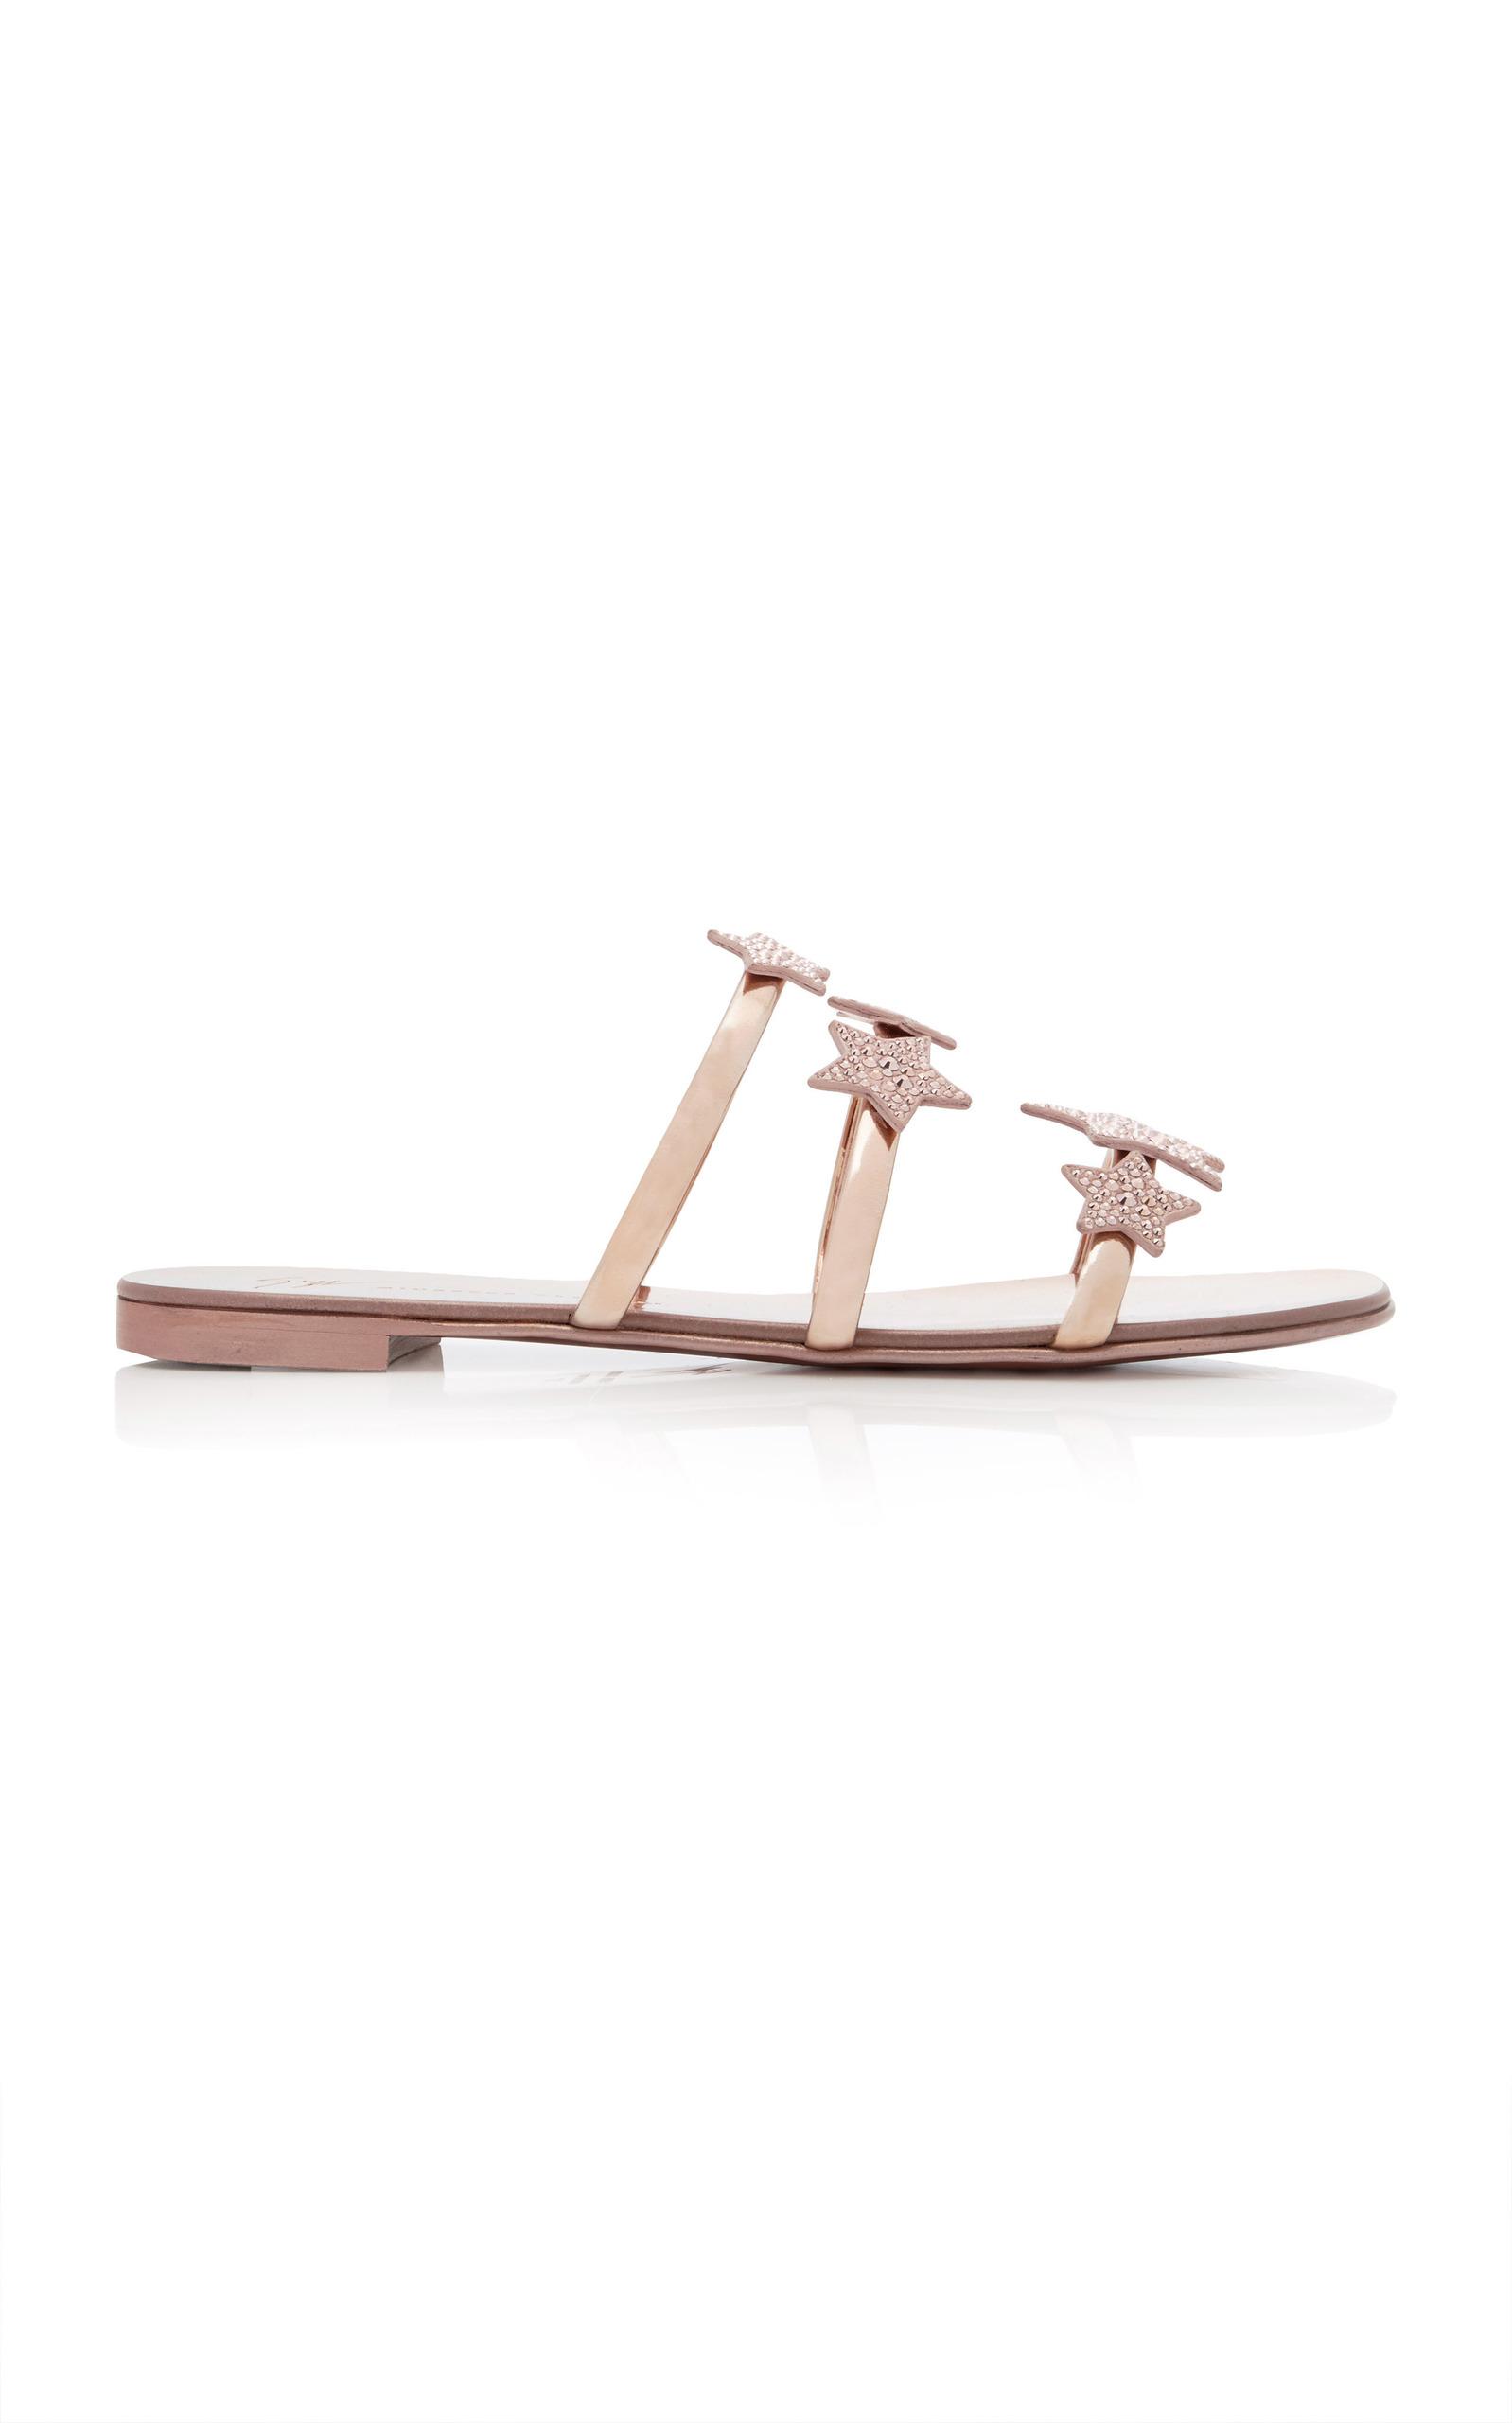 59b08bdf5b76df Giuseppe ZanottiShooting Star Embellished Leather Sandals. CLOSE. Loading